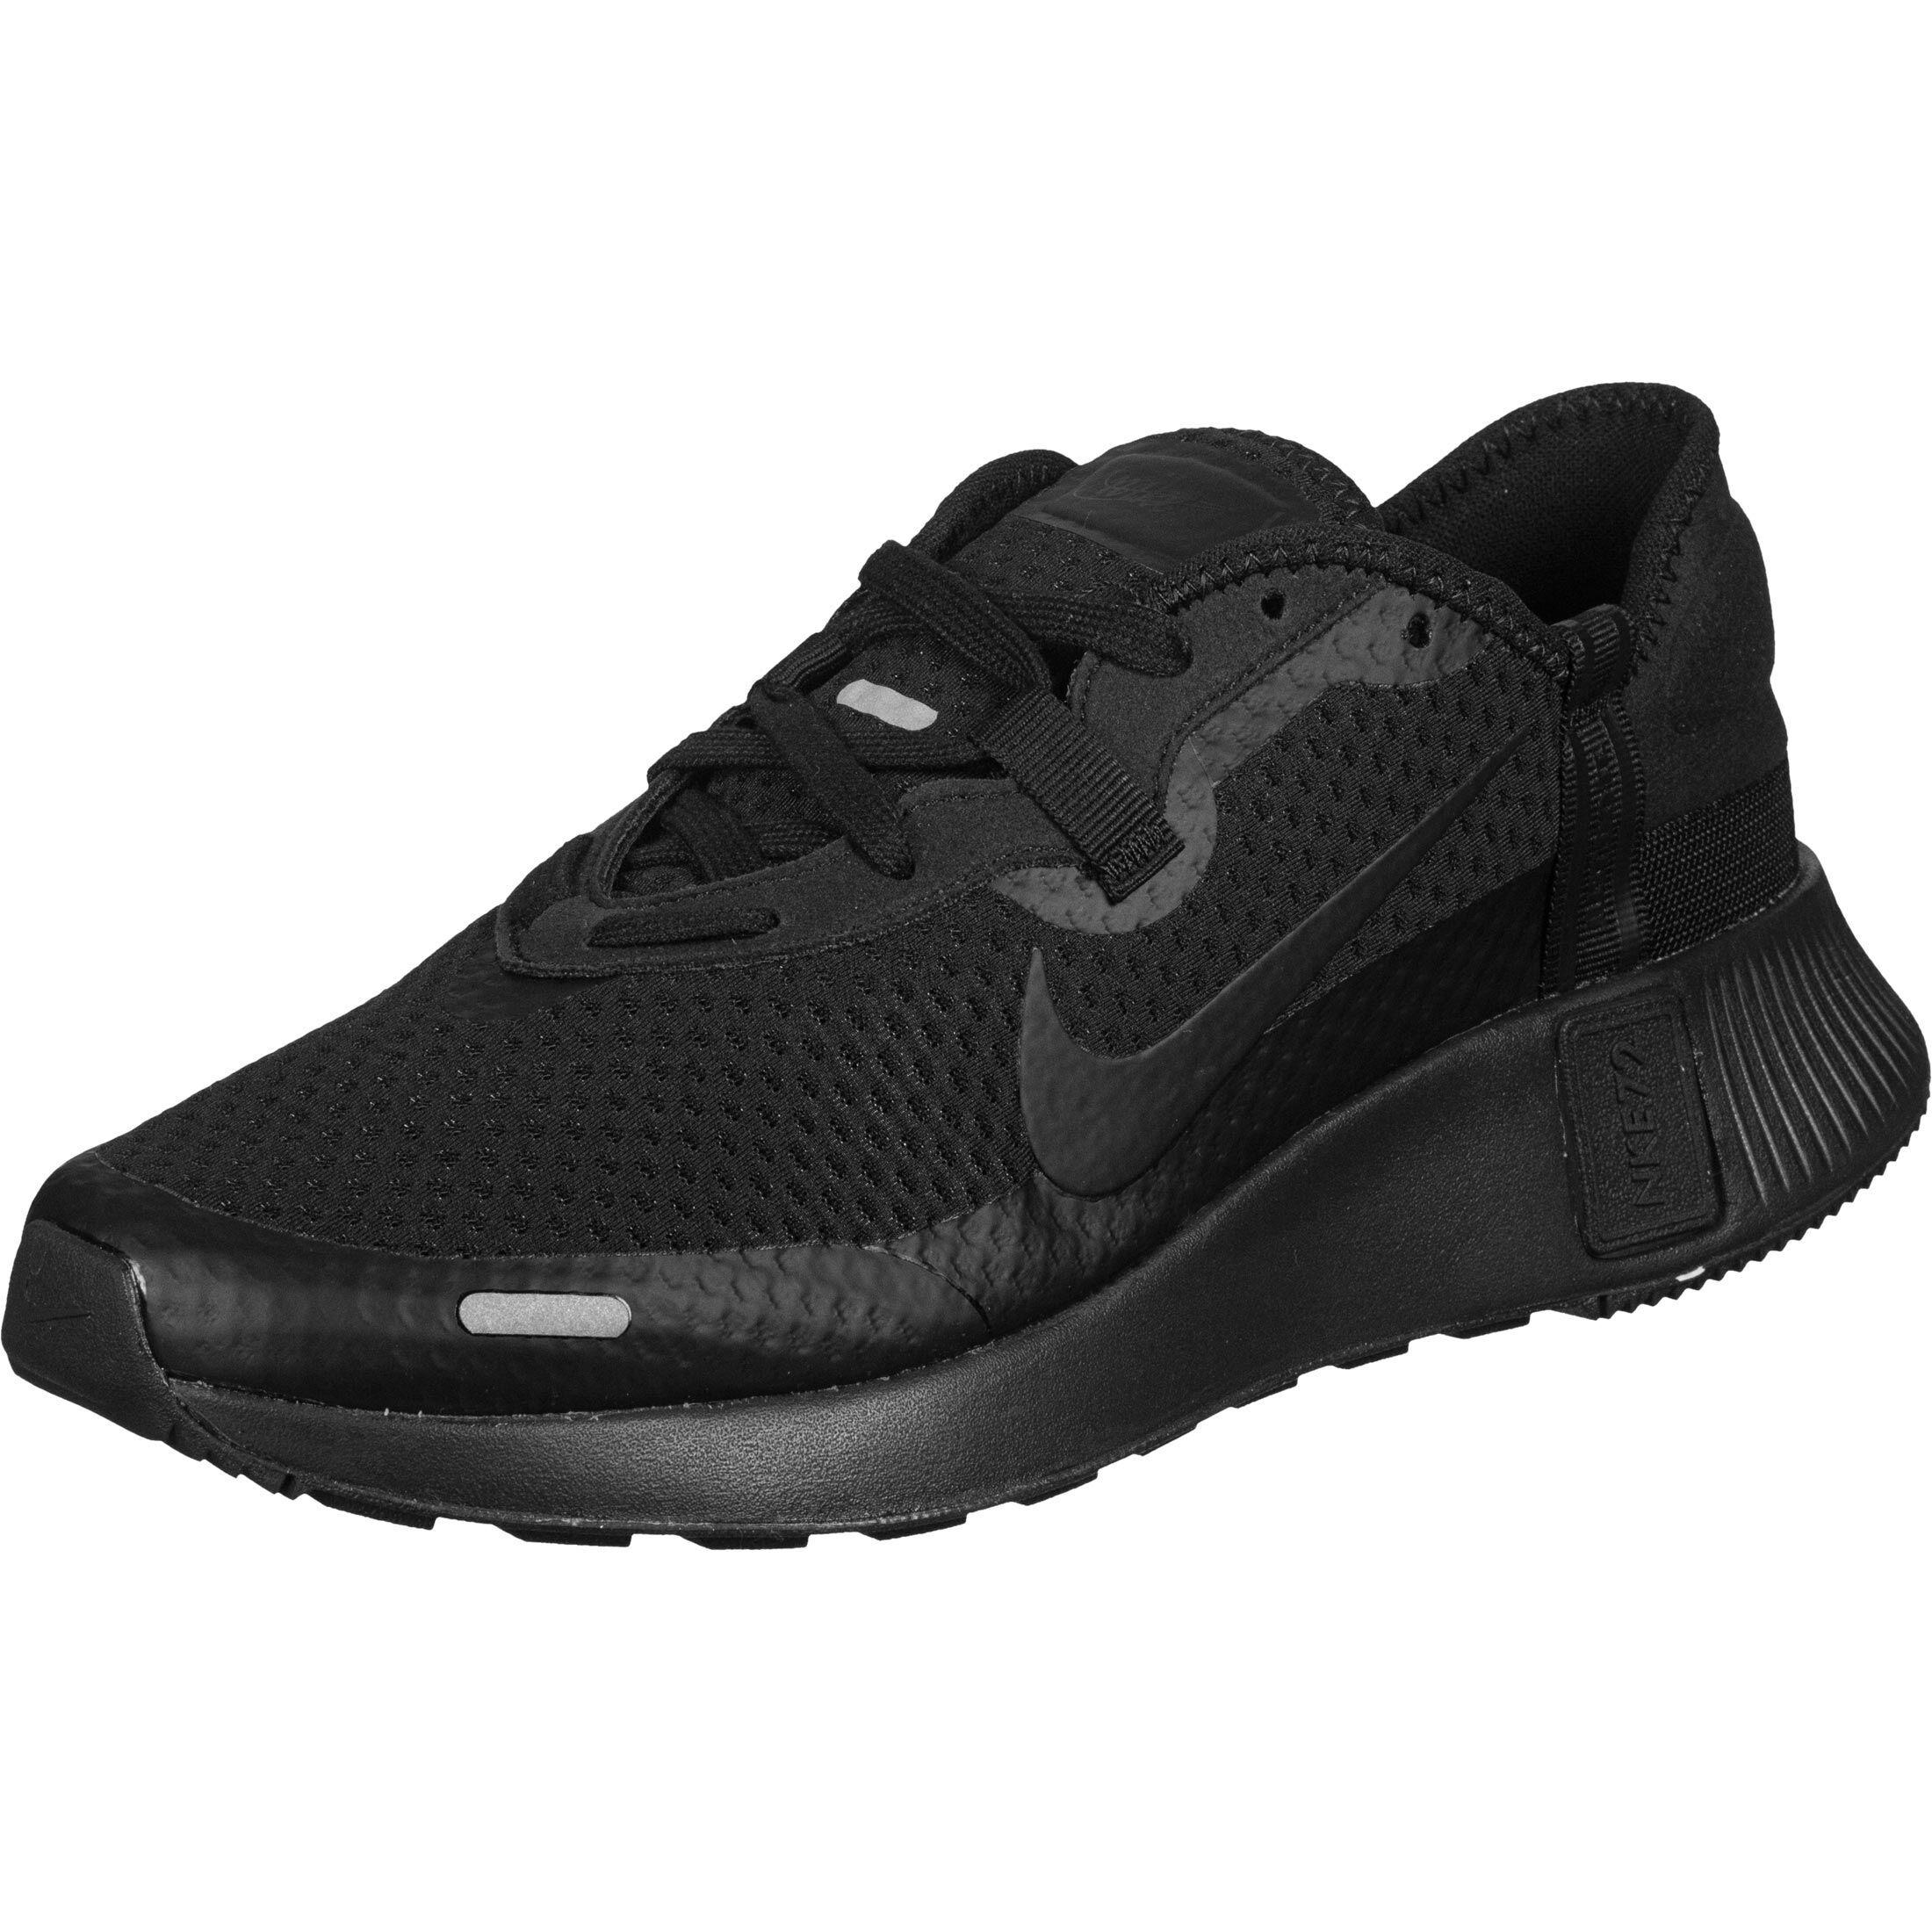 Nike Reposto, 45.5 EU, homme, noir